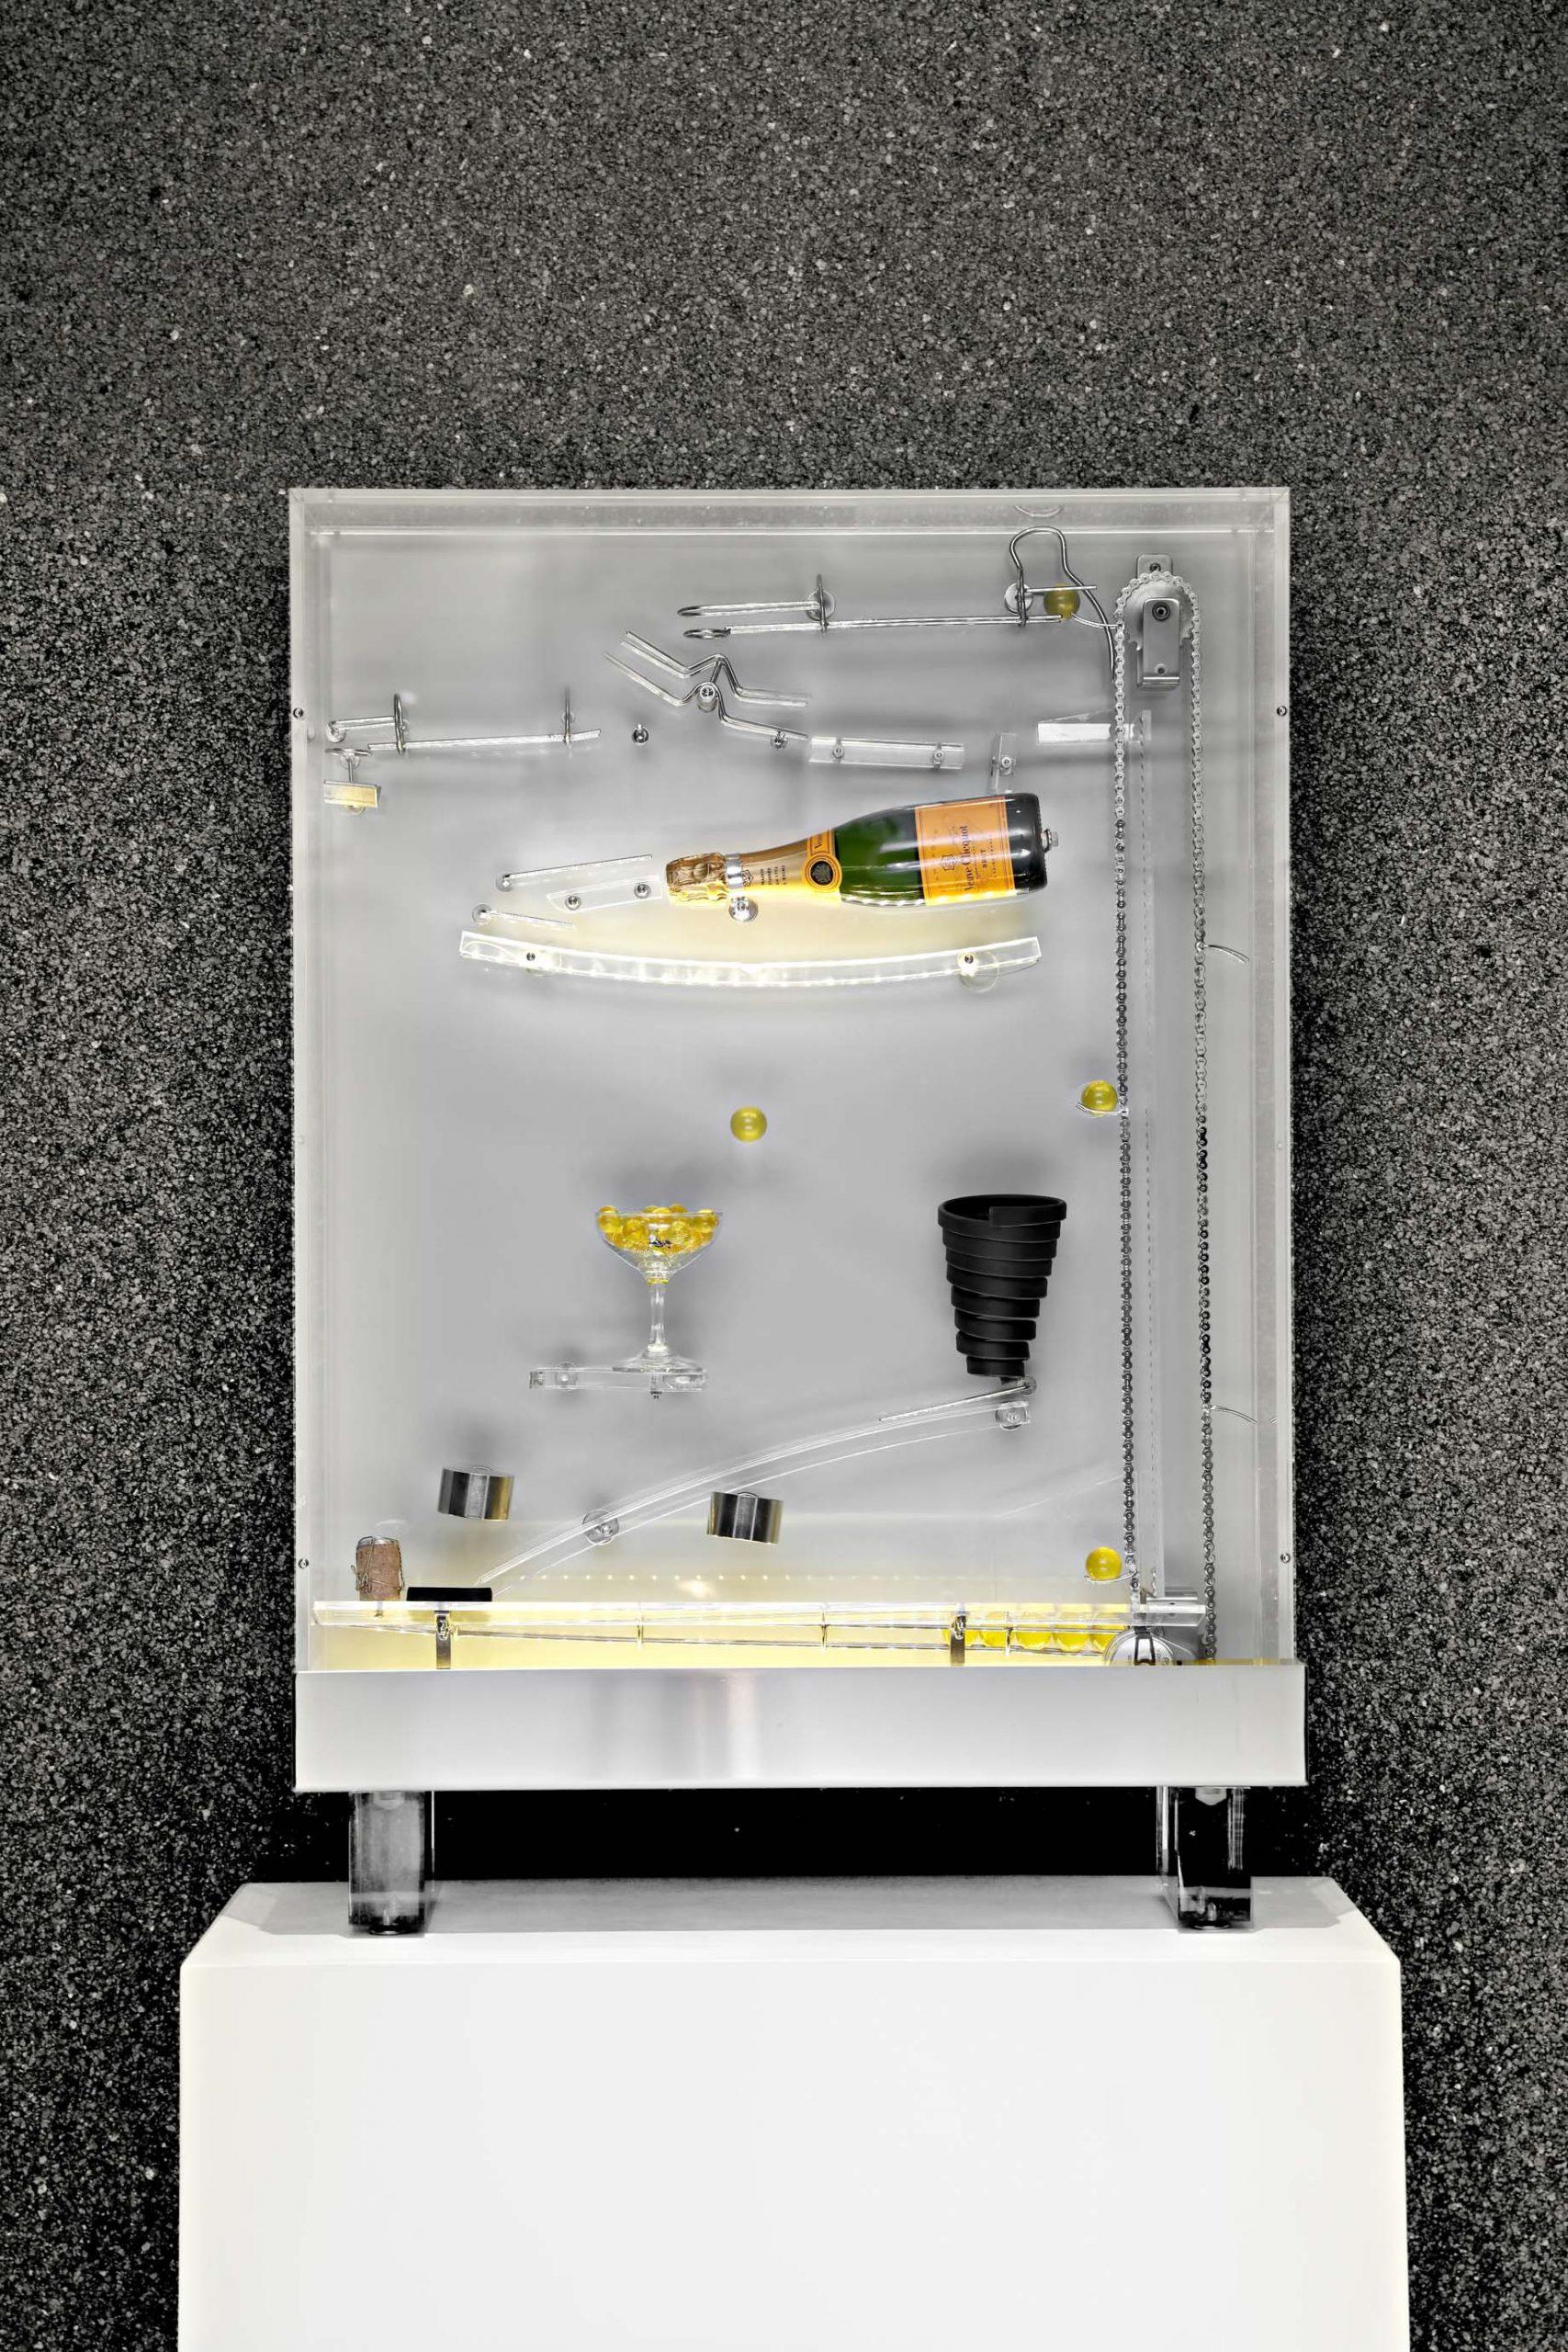 Champagne Pinball Machine - 924 Bel Air Rd, Los Angeles, CA, USA